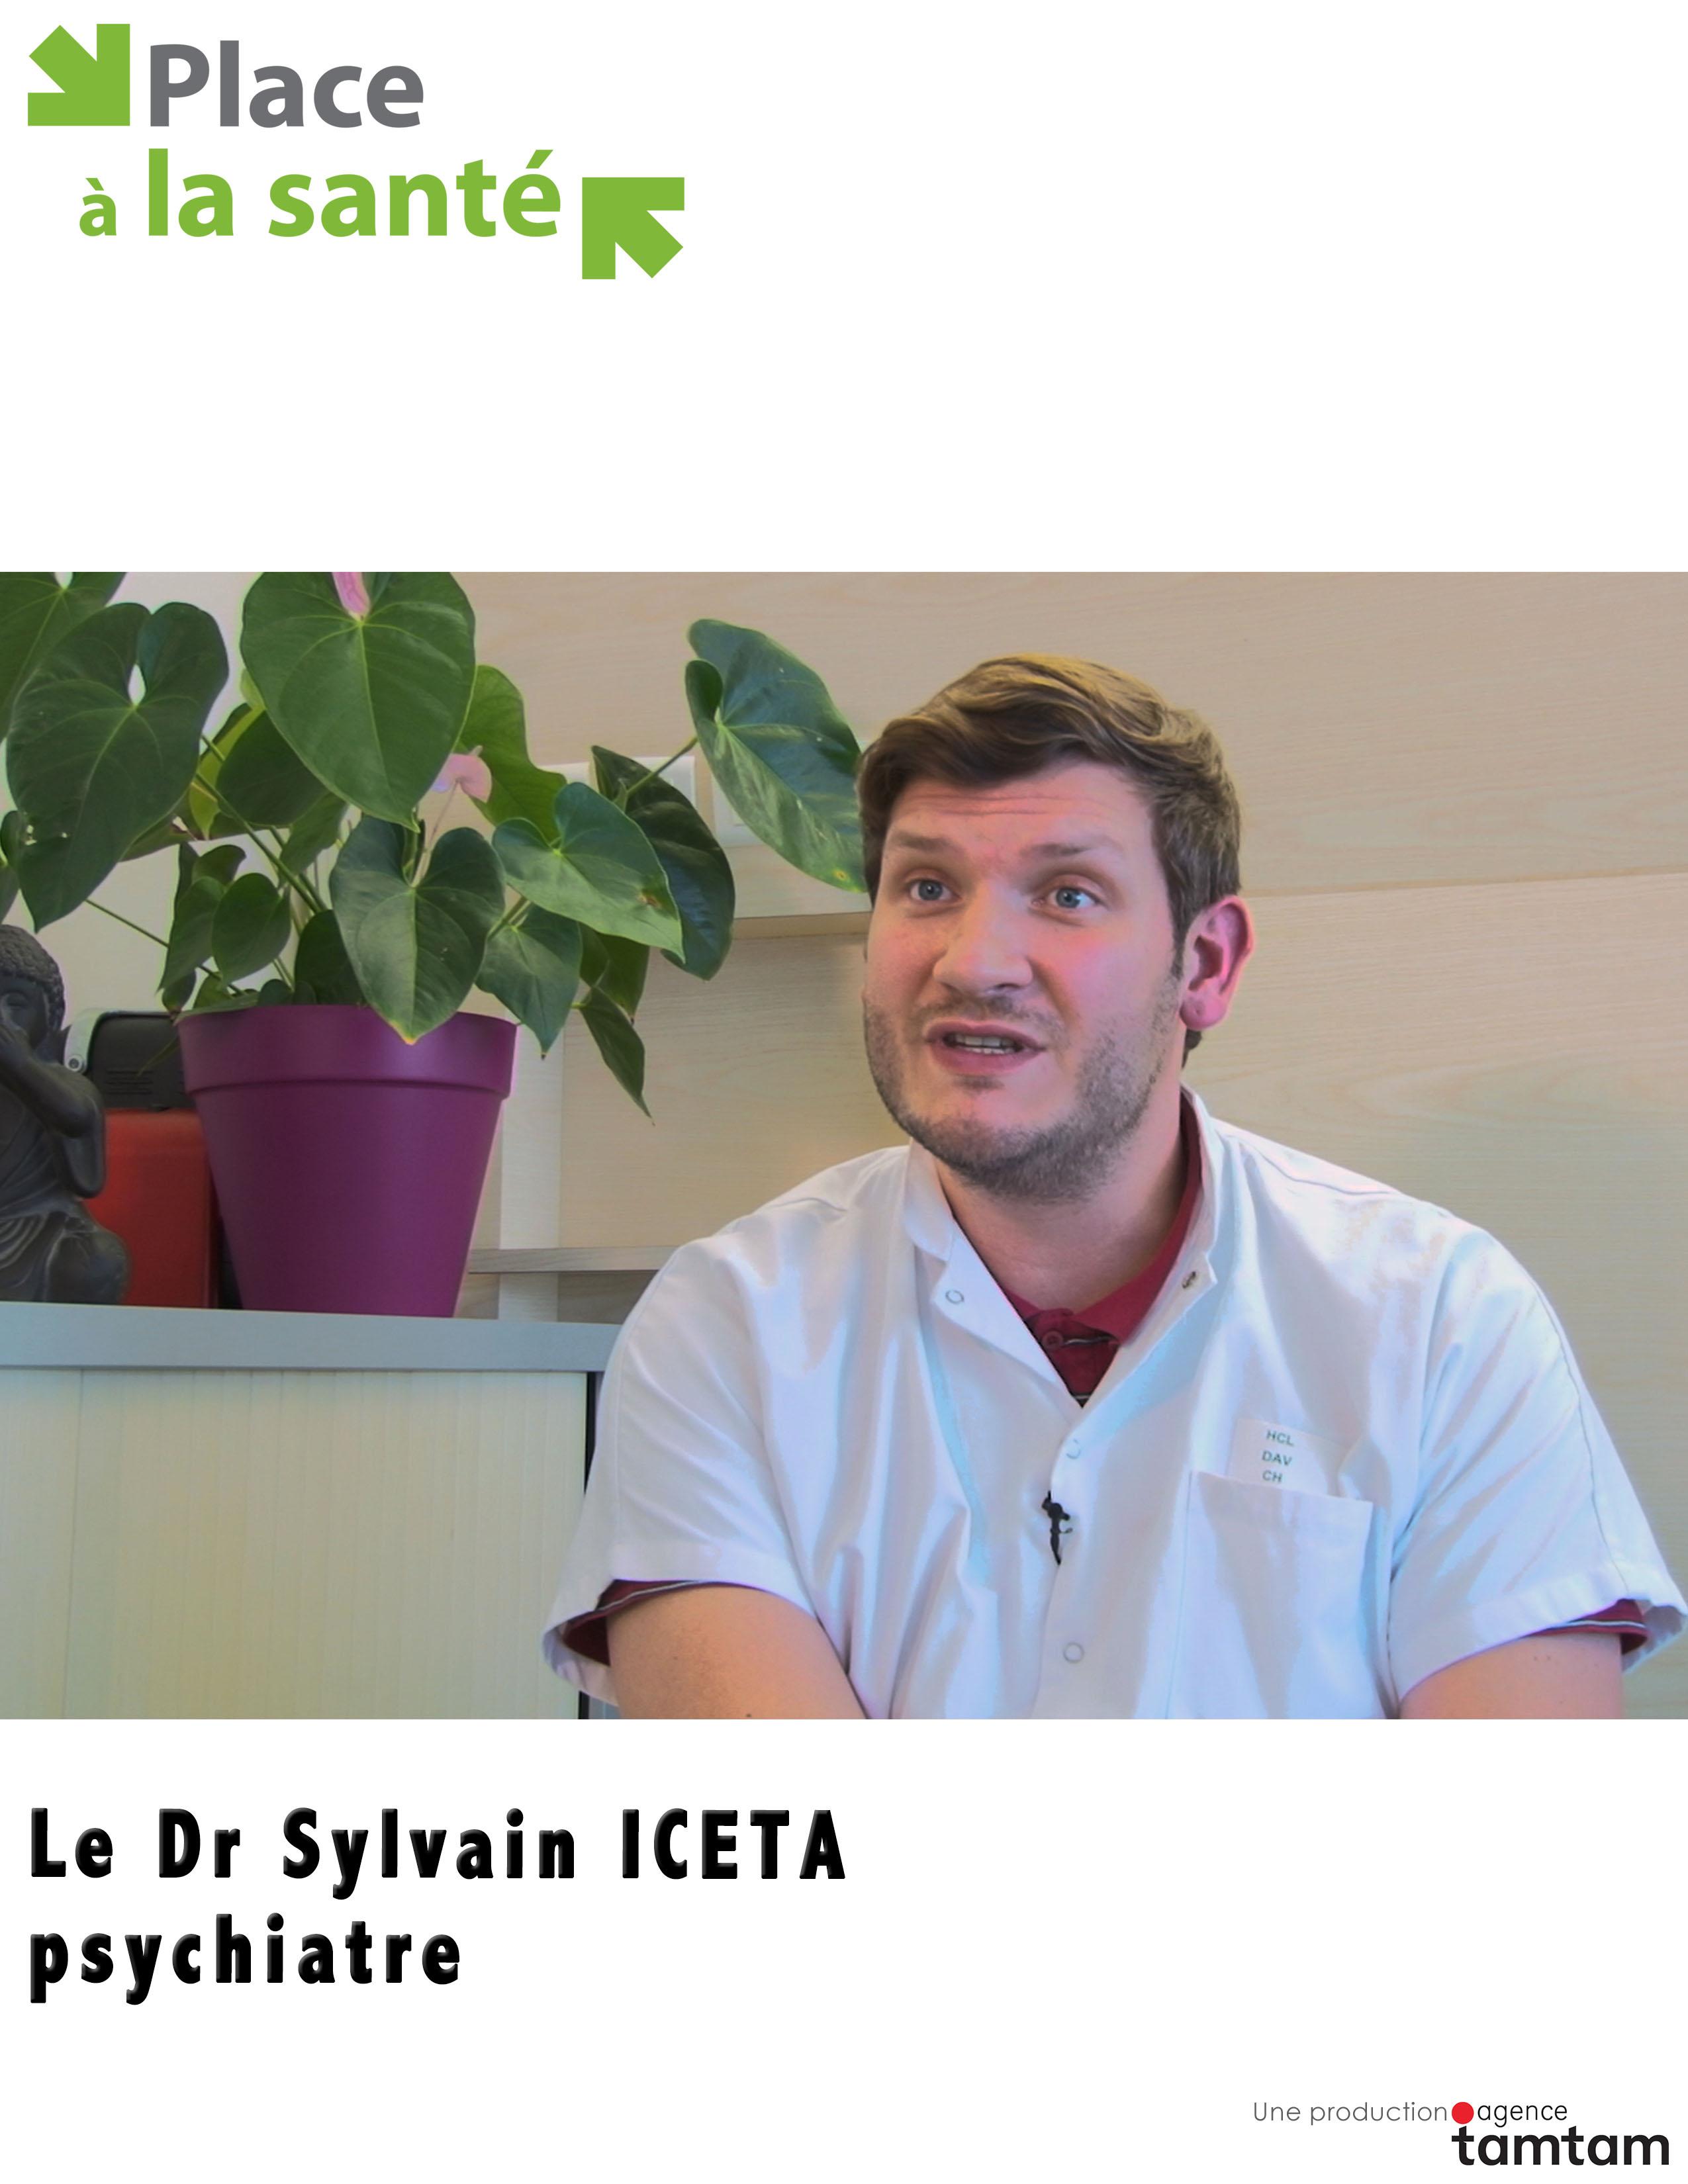 Le Dr Sylvain Iceta, psychiatre